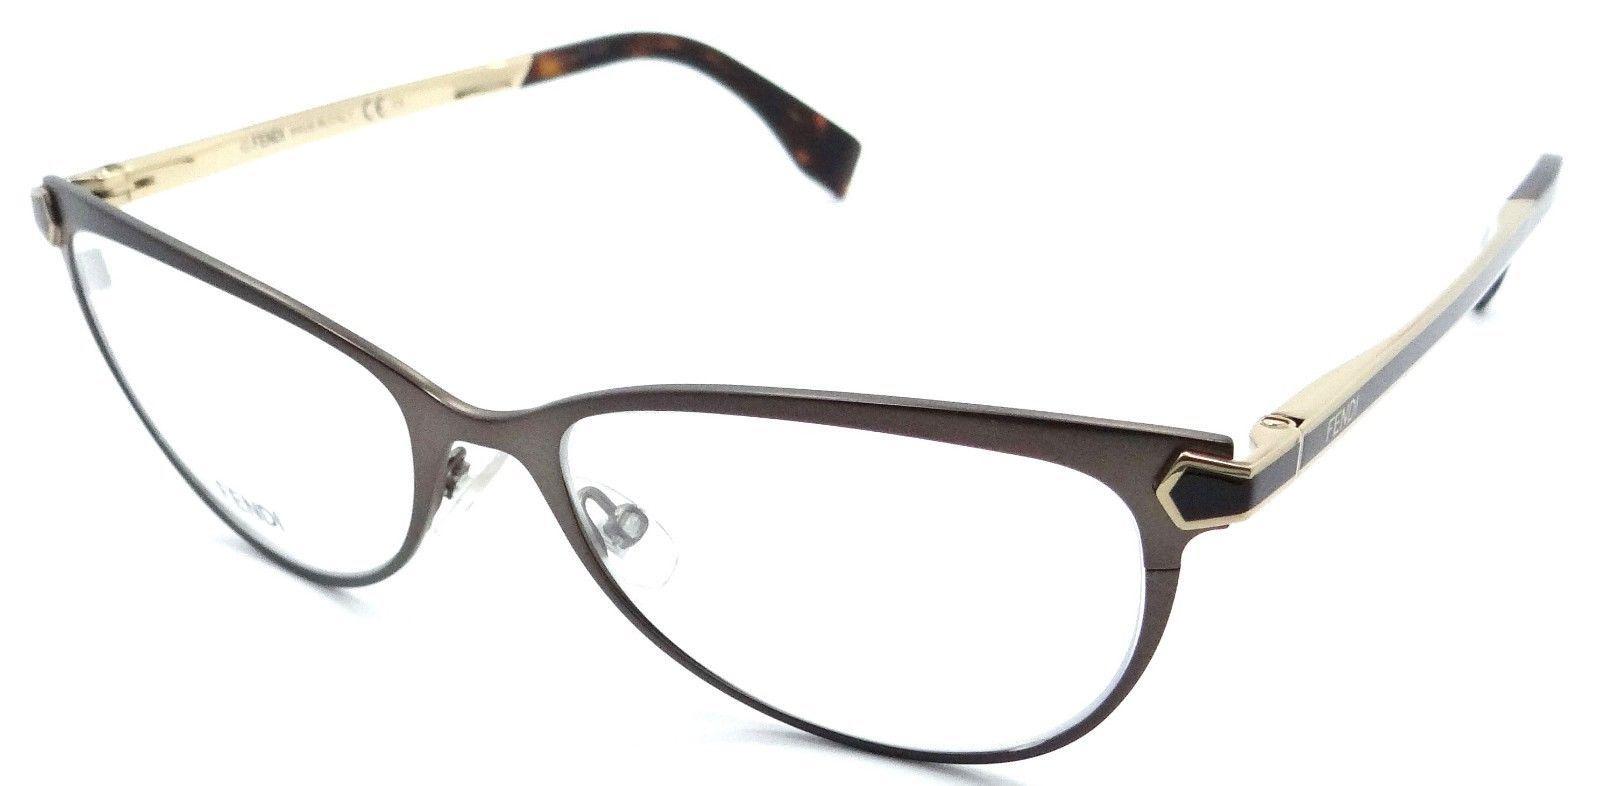 Fendi Rx Eyeglasses Frames FF 0024 7WG and 50 similar items